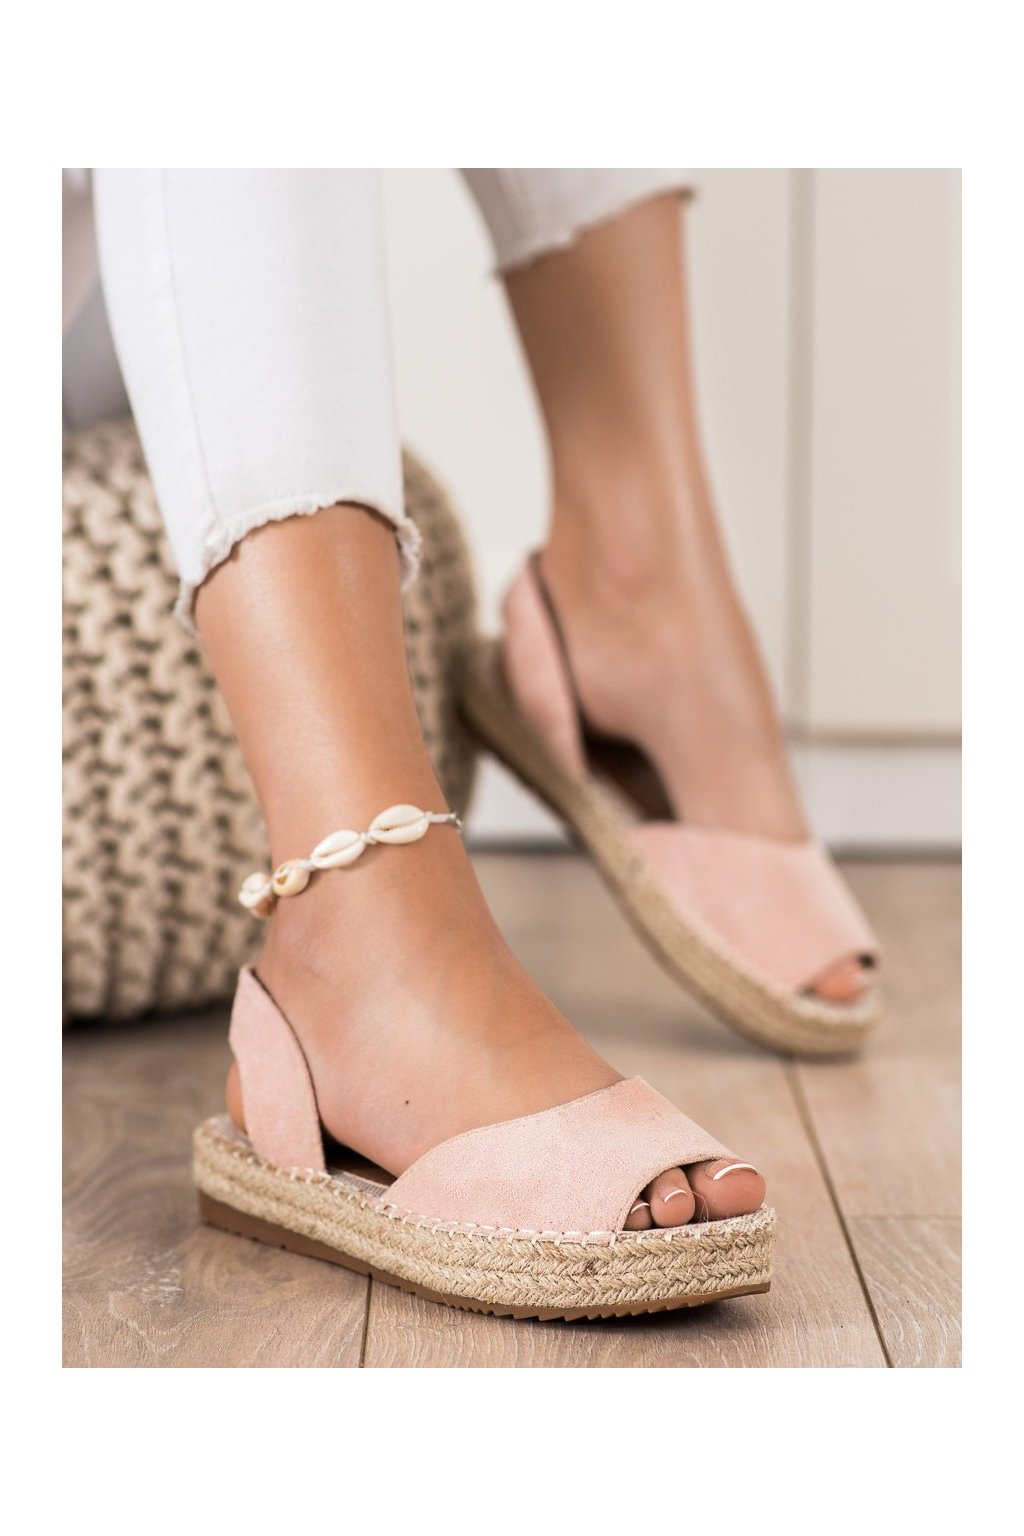 Ružové sandále Ideal shoes kod 6915P